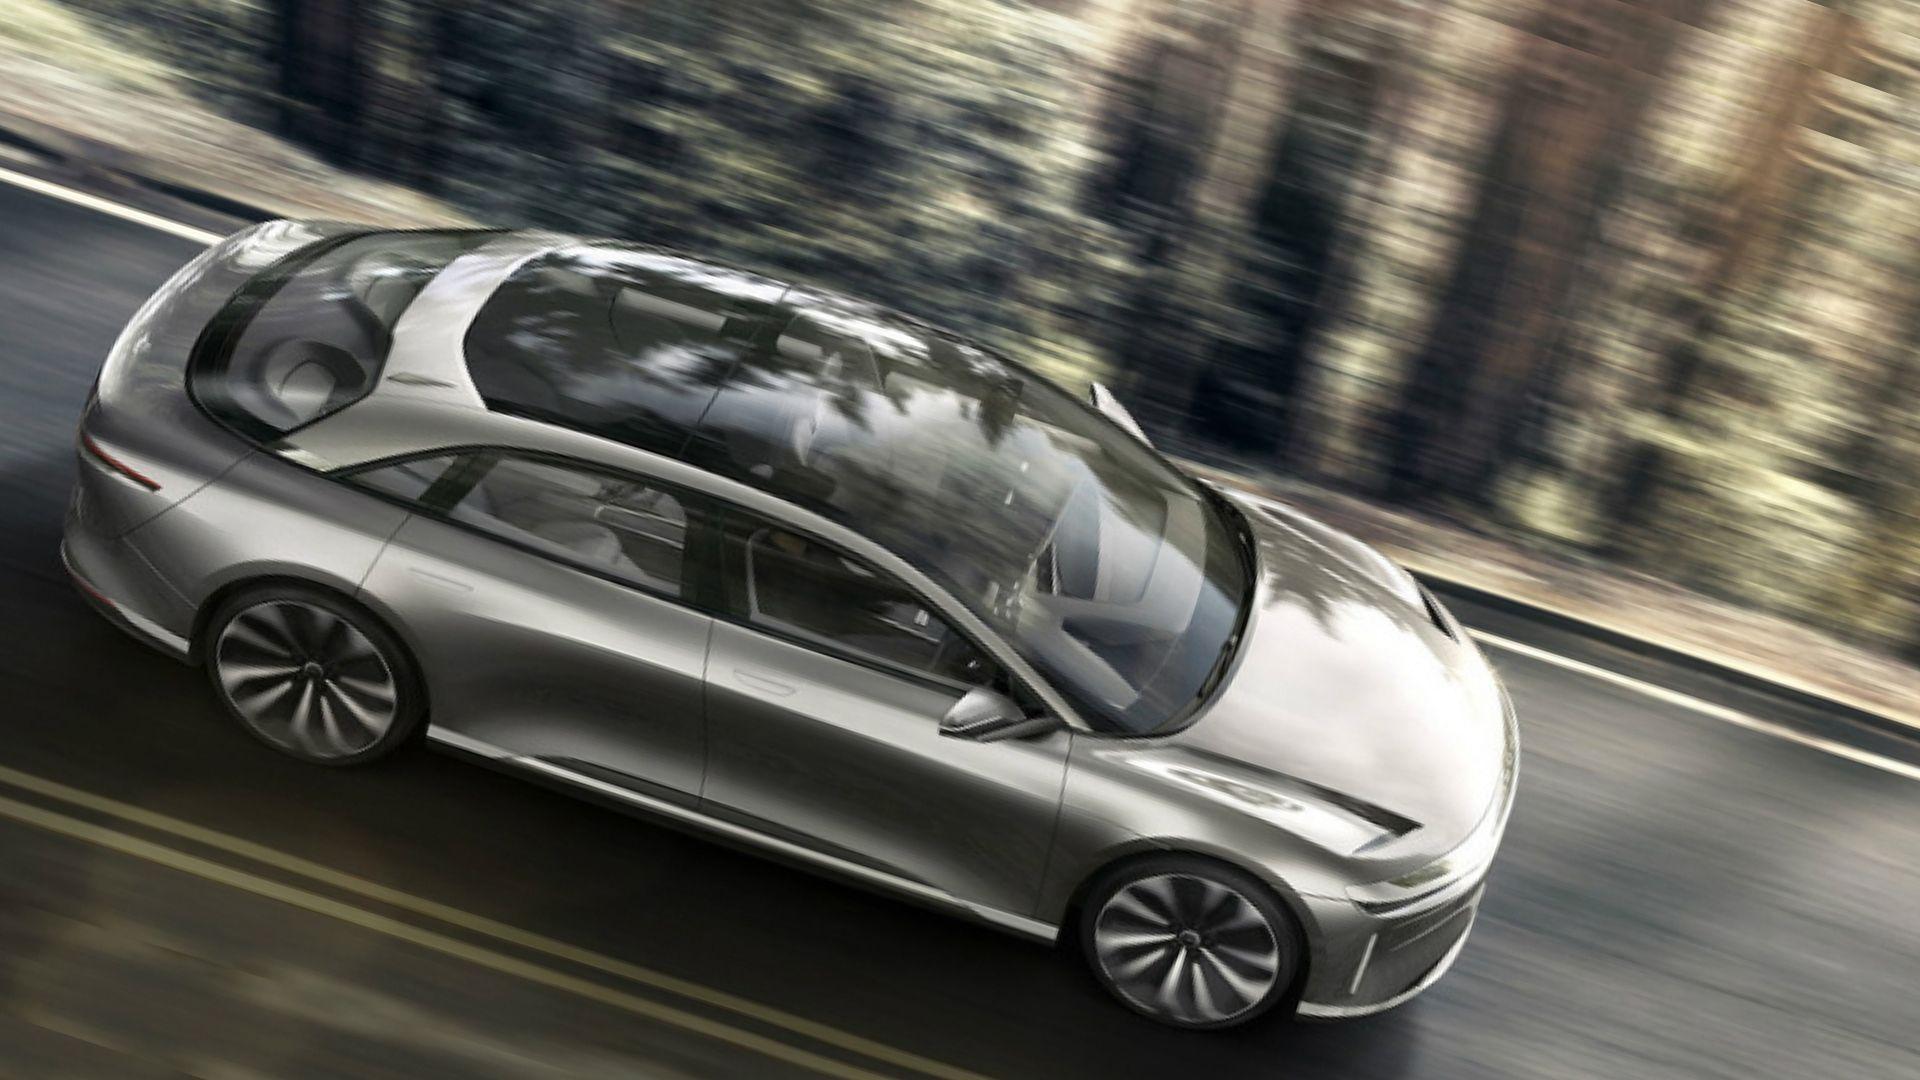 New 2018 Tesla Model S Release Date Good Cars 2018 2019 Model Year